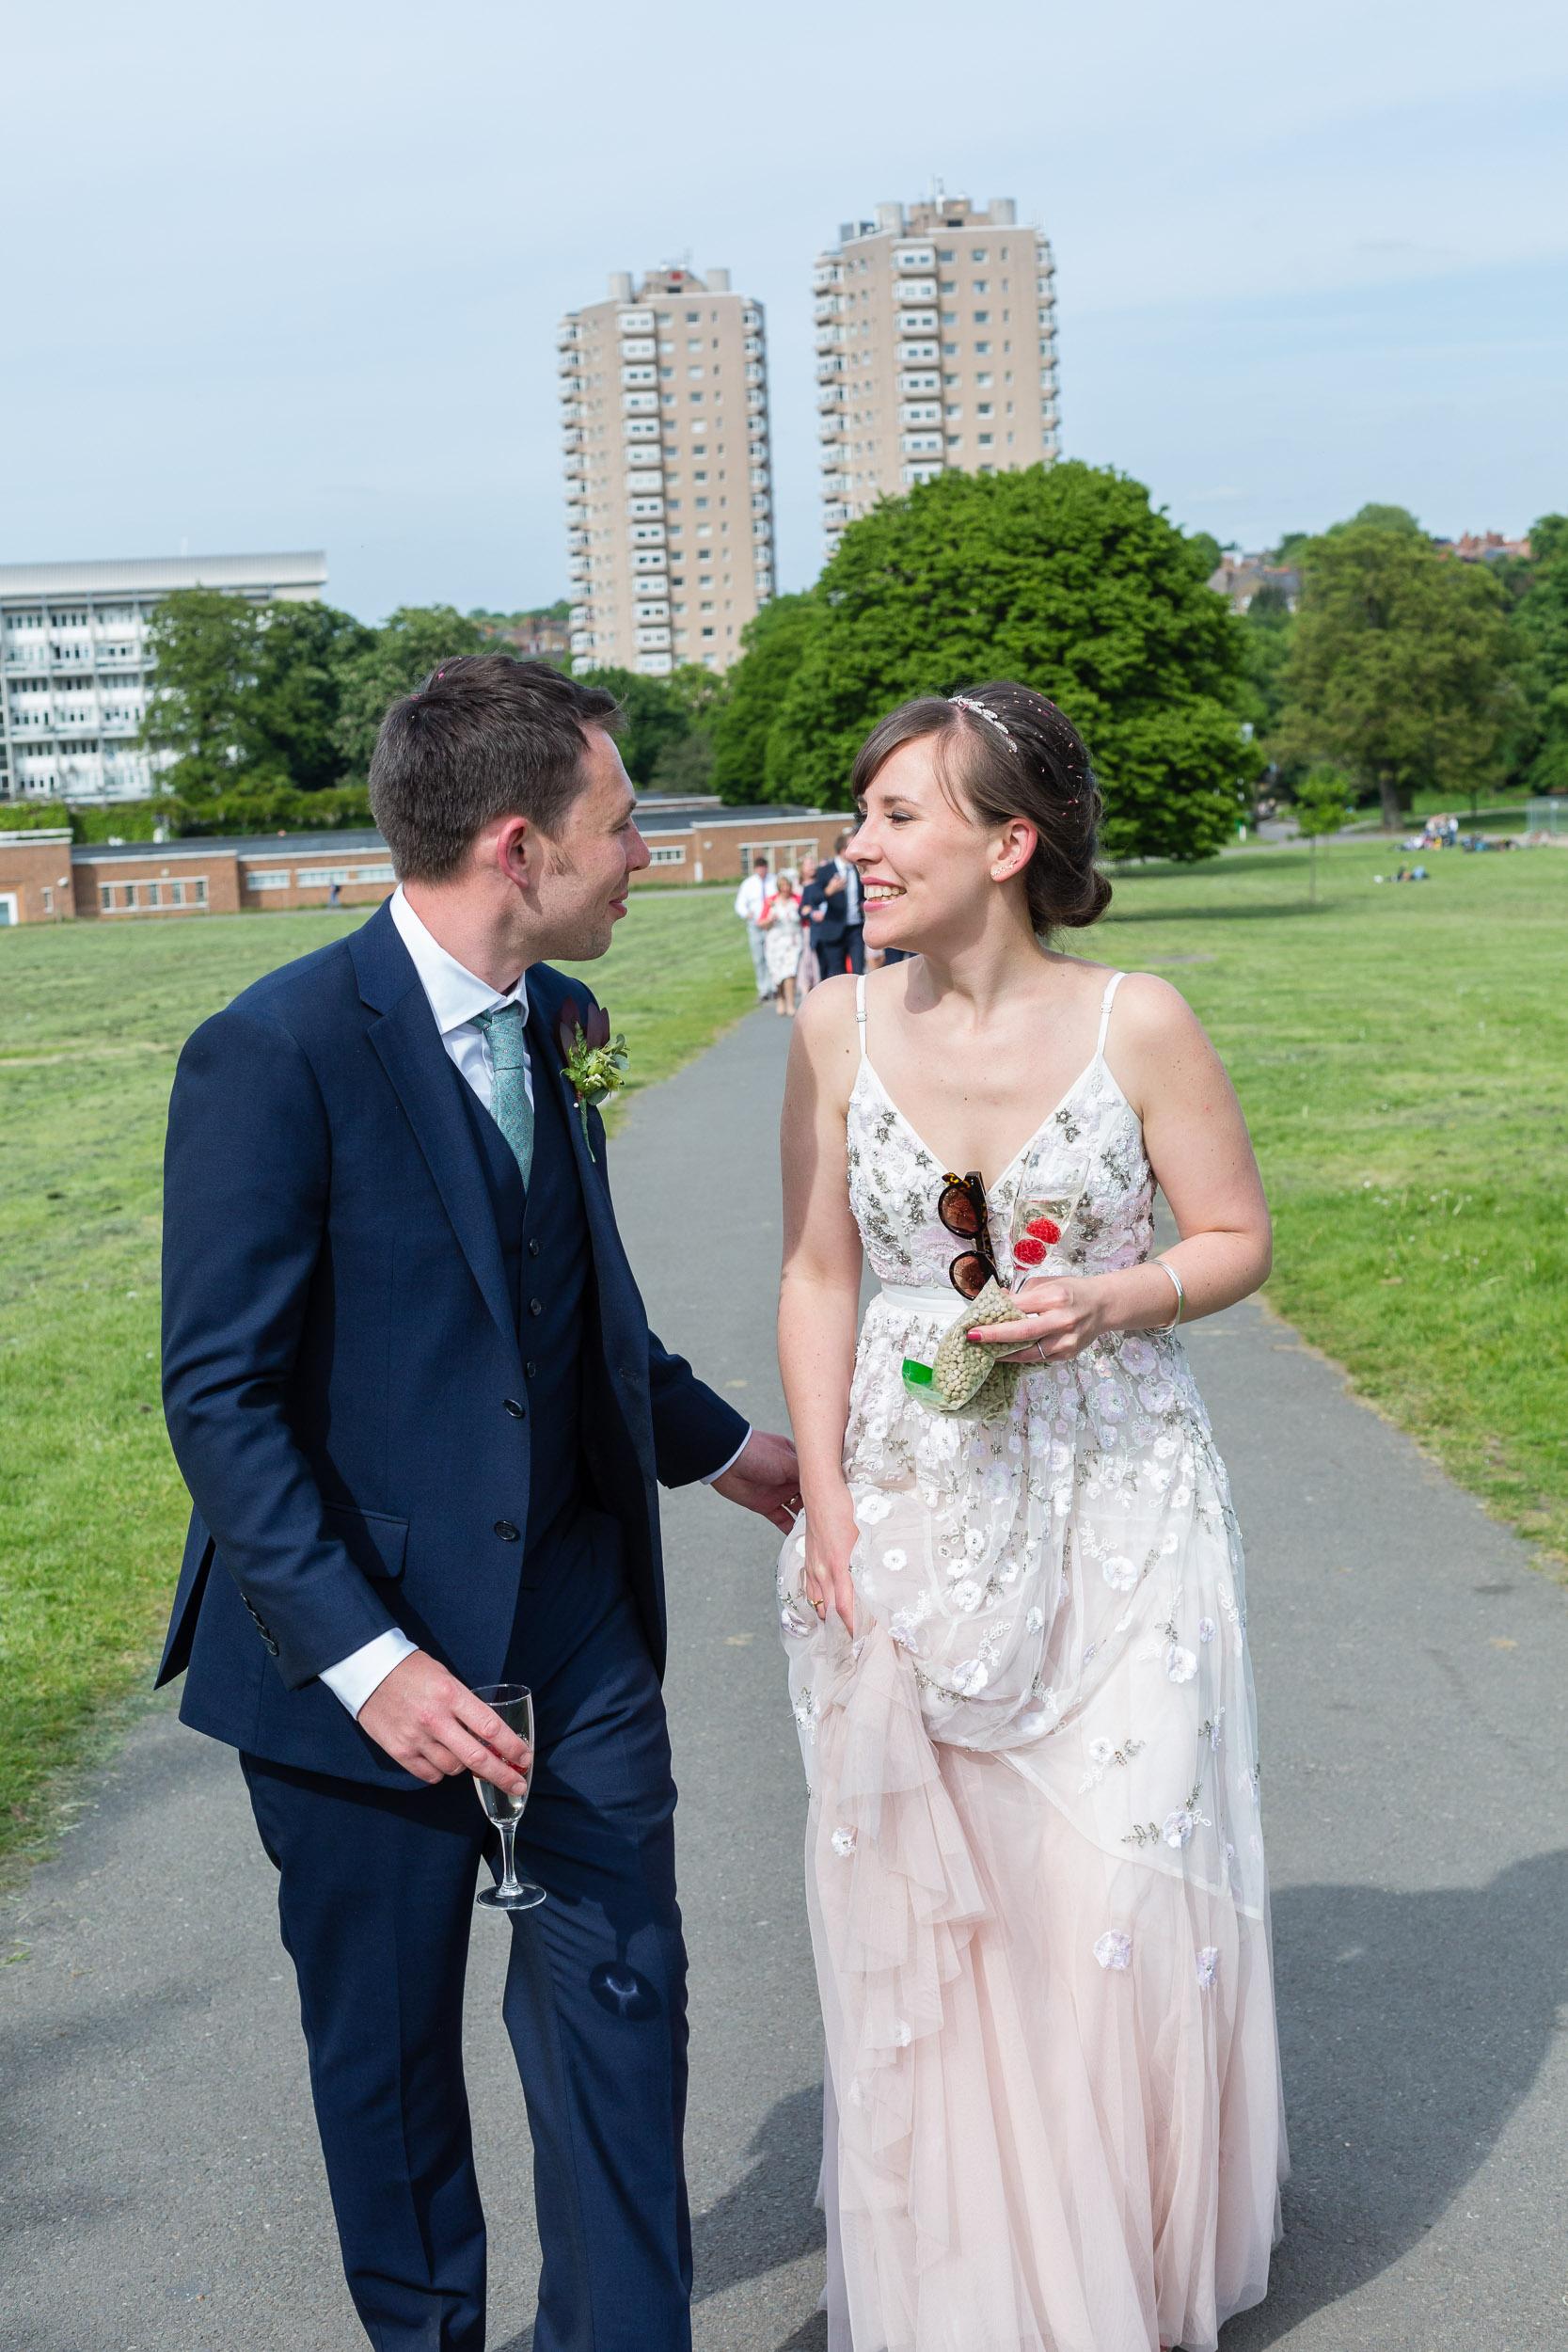 brockwell-lido-brixton-herne-hill-wedding-252.jpg